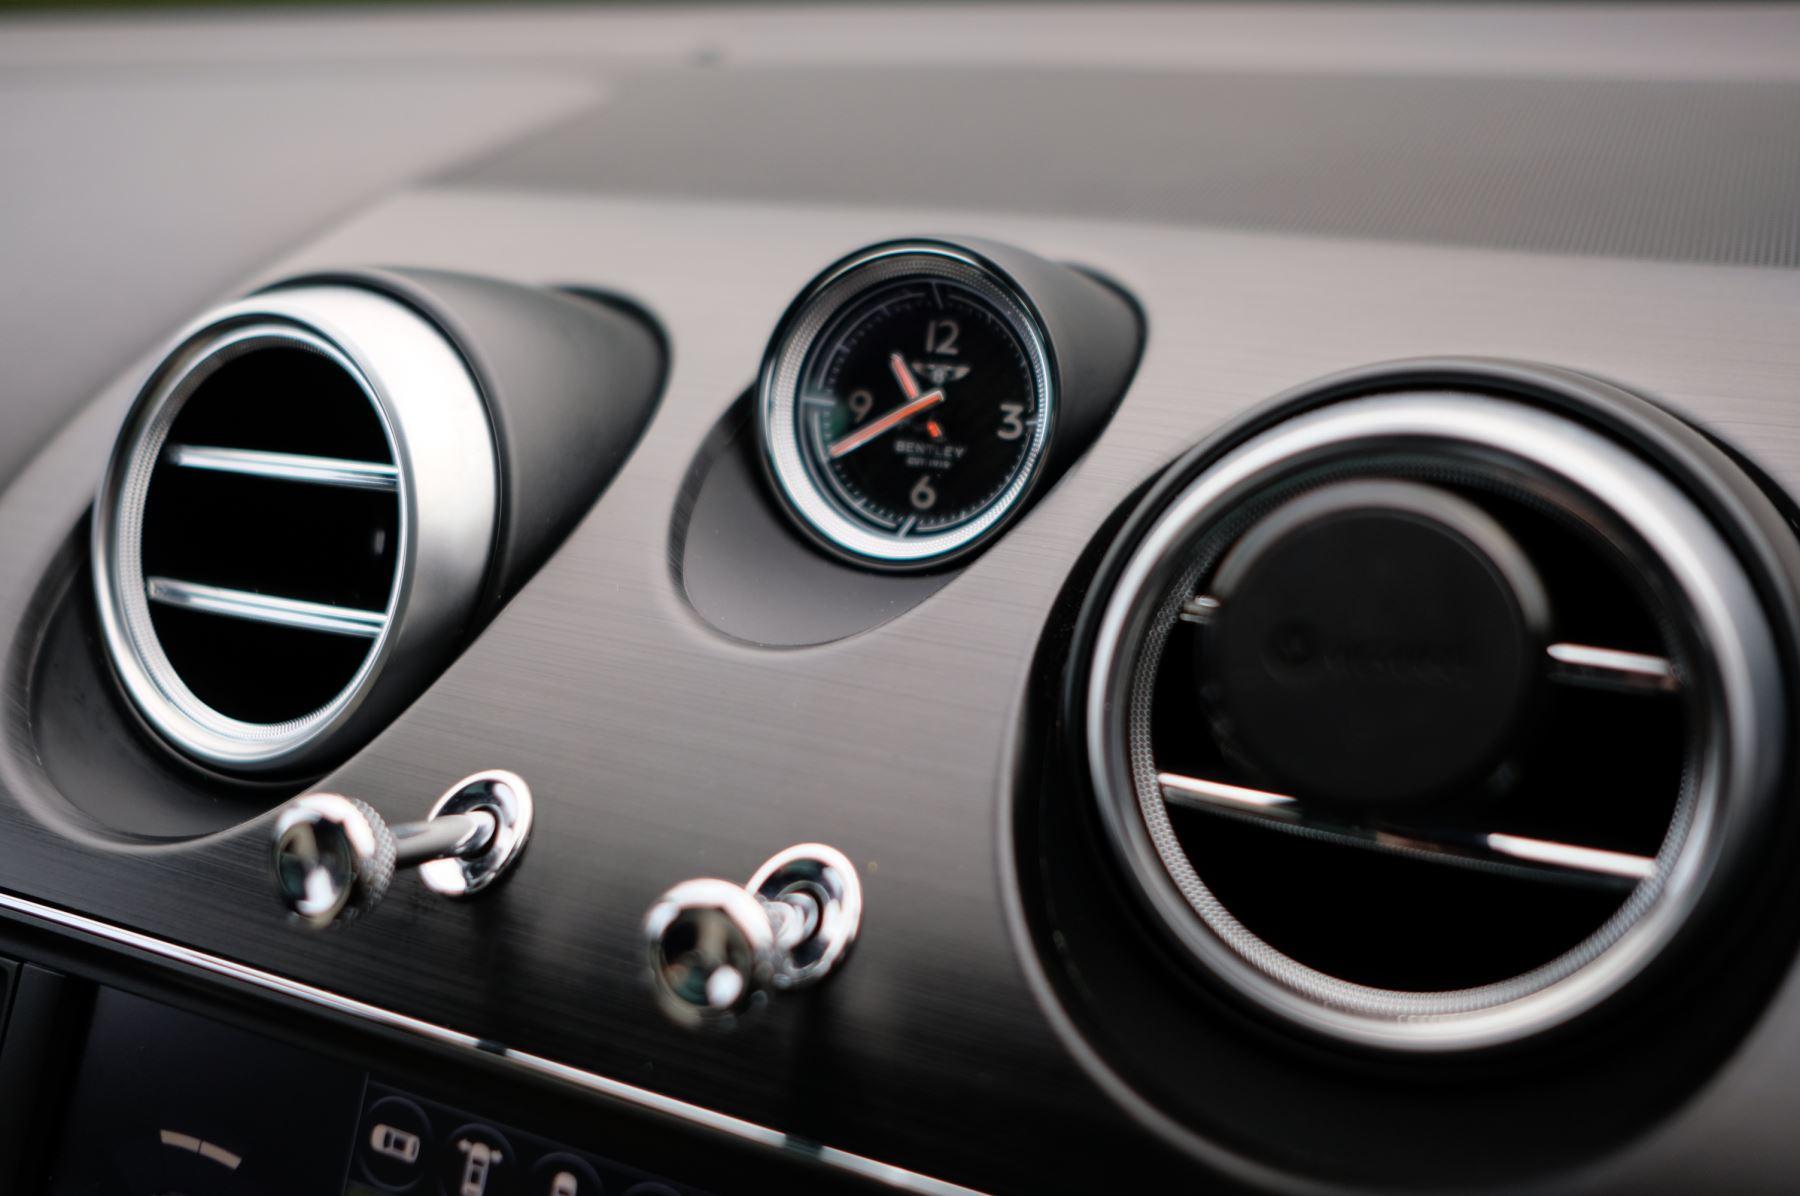 Bentley Bentayga Diesel 4.0 V8 Mulliner Driving Spec 5dr Auto - 7 Seat Specification image 22